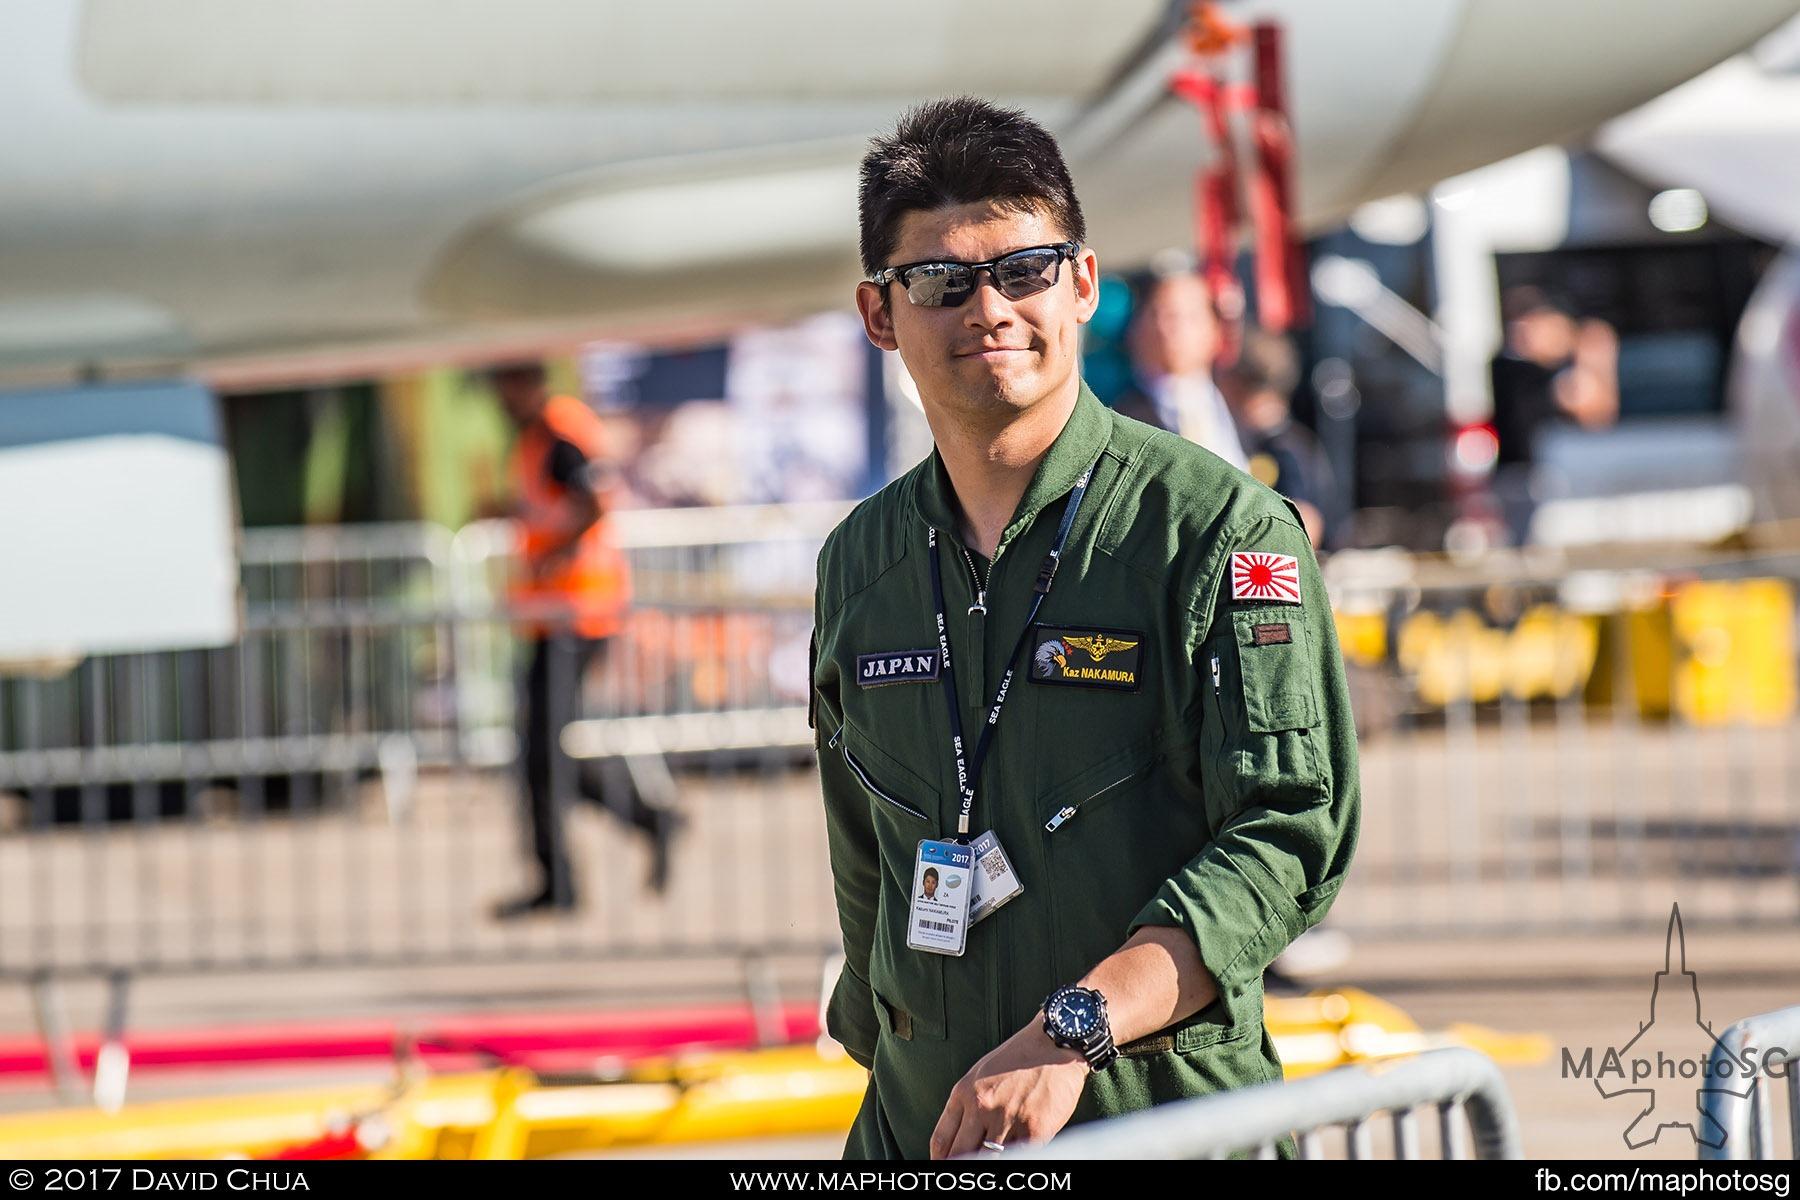 8. A crew member of the Japan Maritime Self-Defence Force Kawasaki P-1 Maritime Patrol Aircraft.